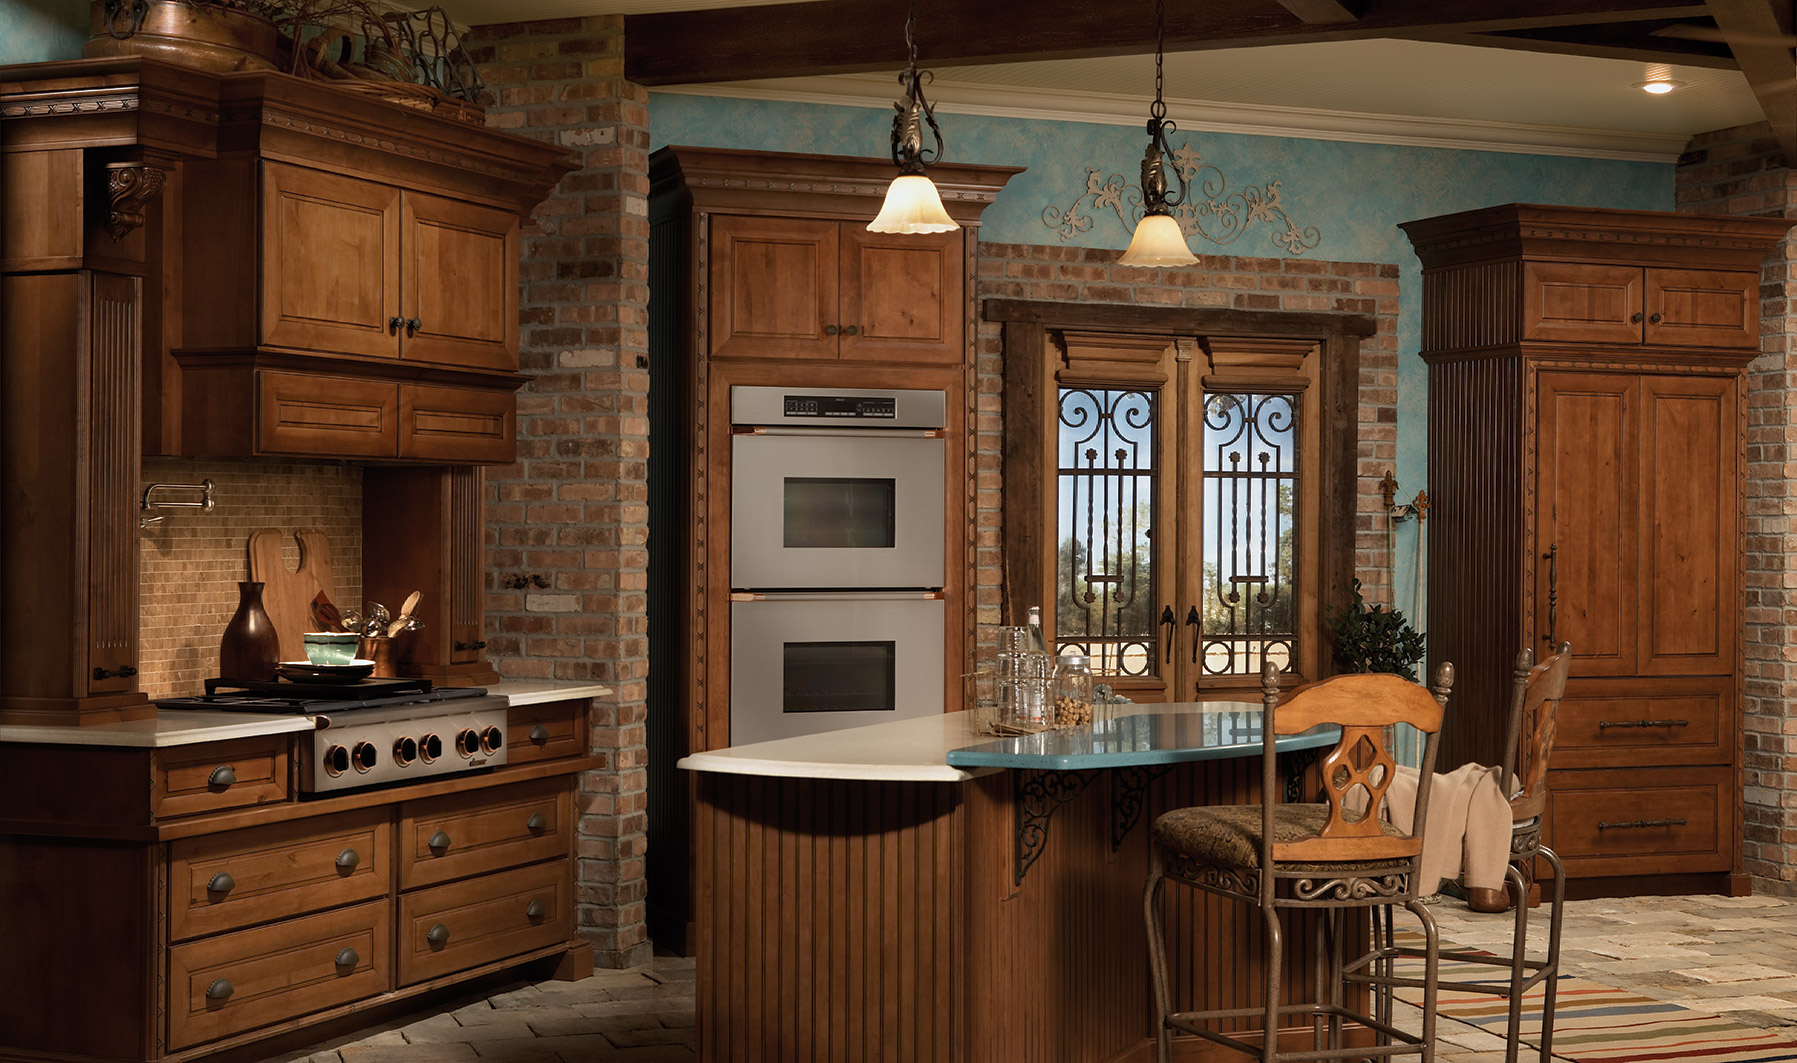 yorktowne cabinets • Morrellphotoworks